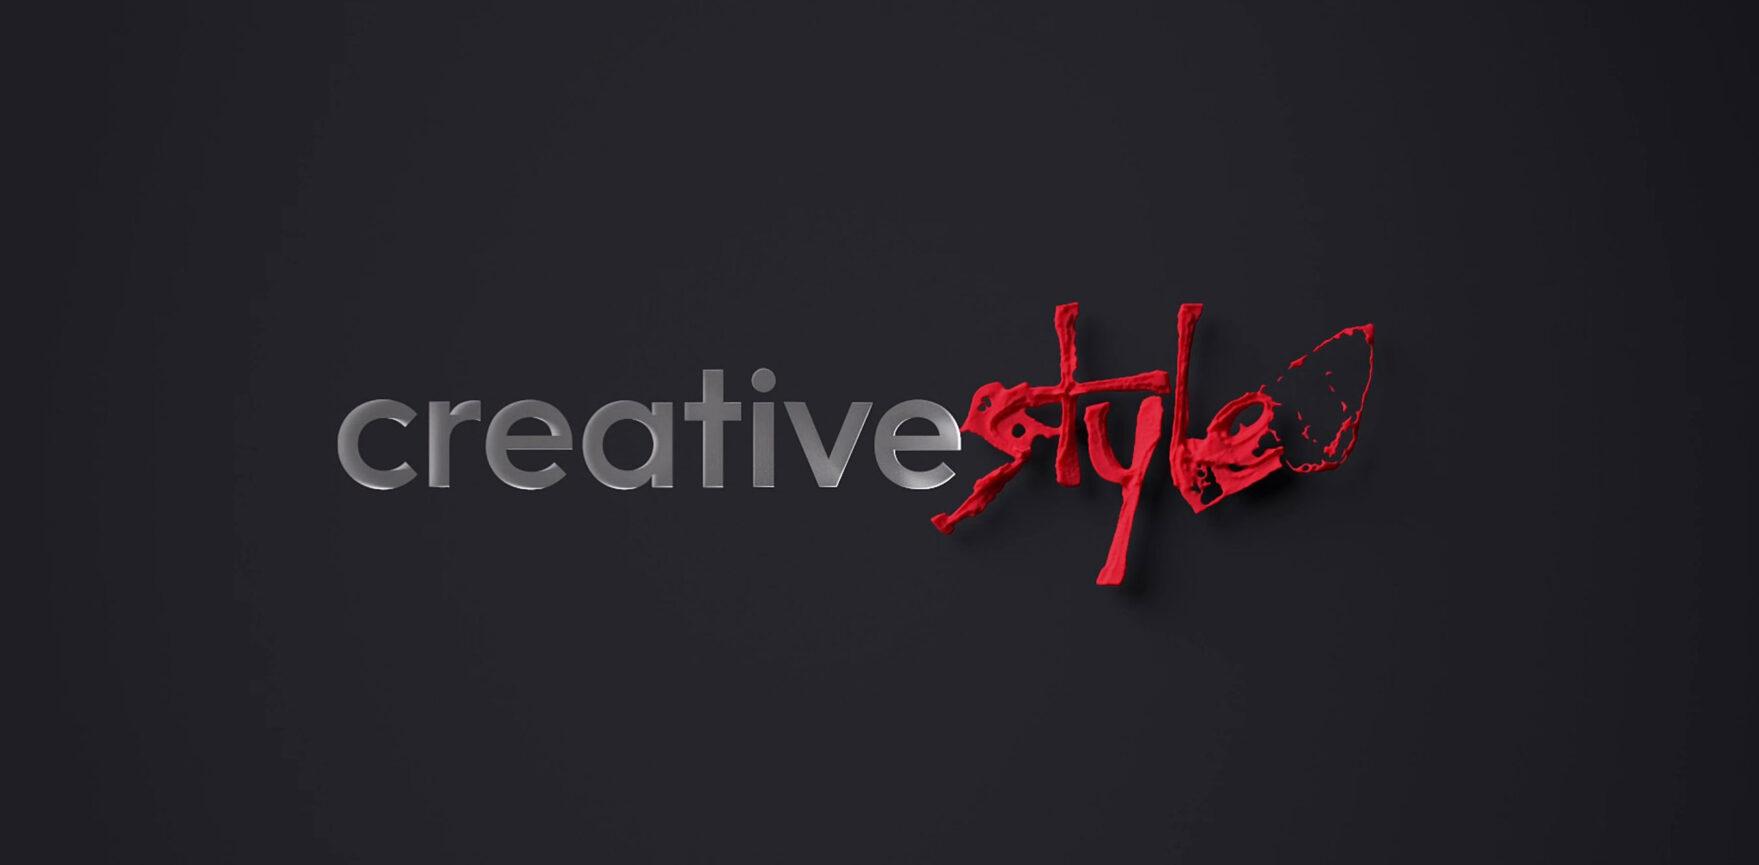 Motion Design 3D Logo creativestyle GmbH